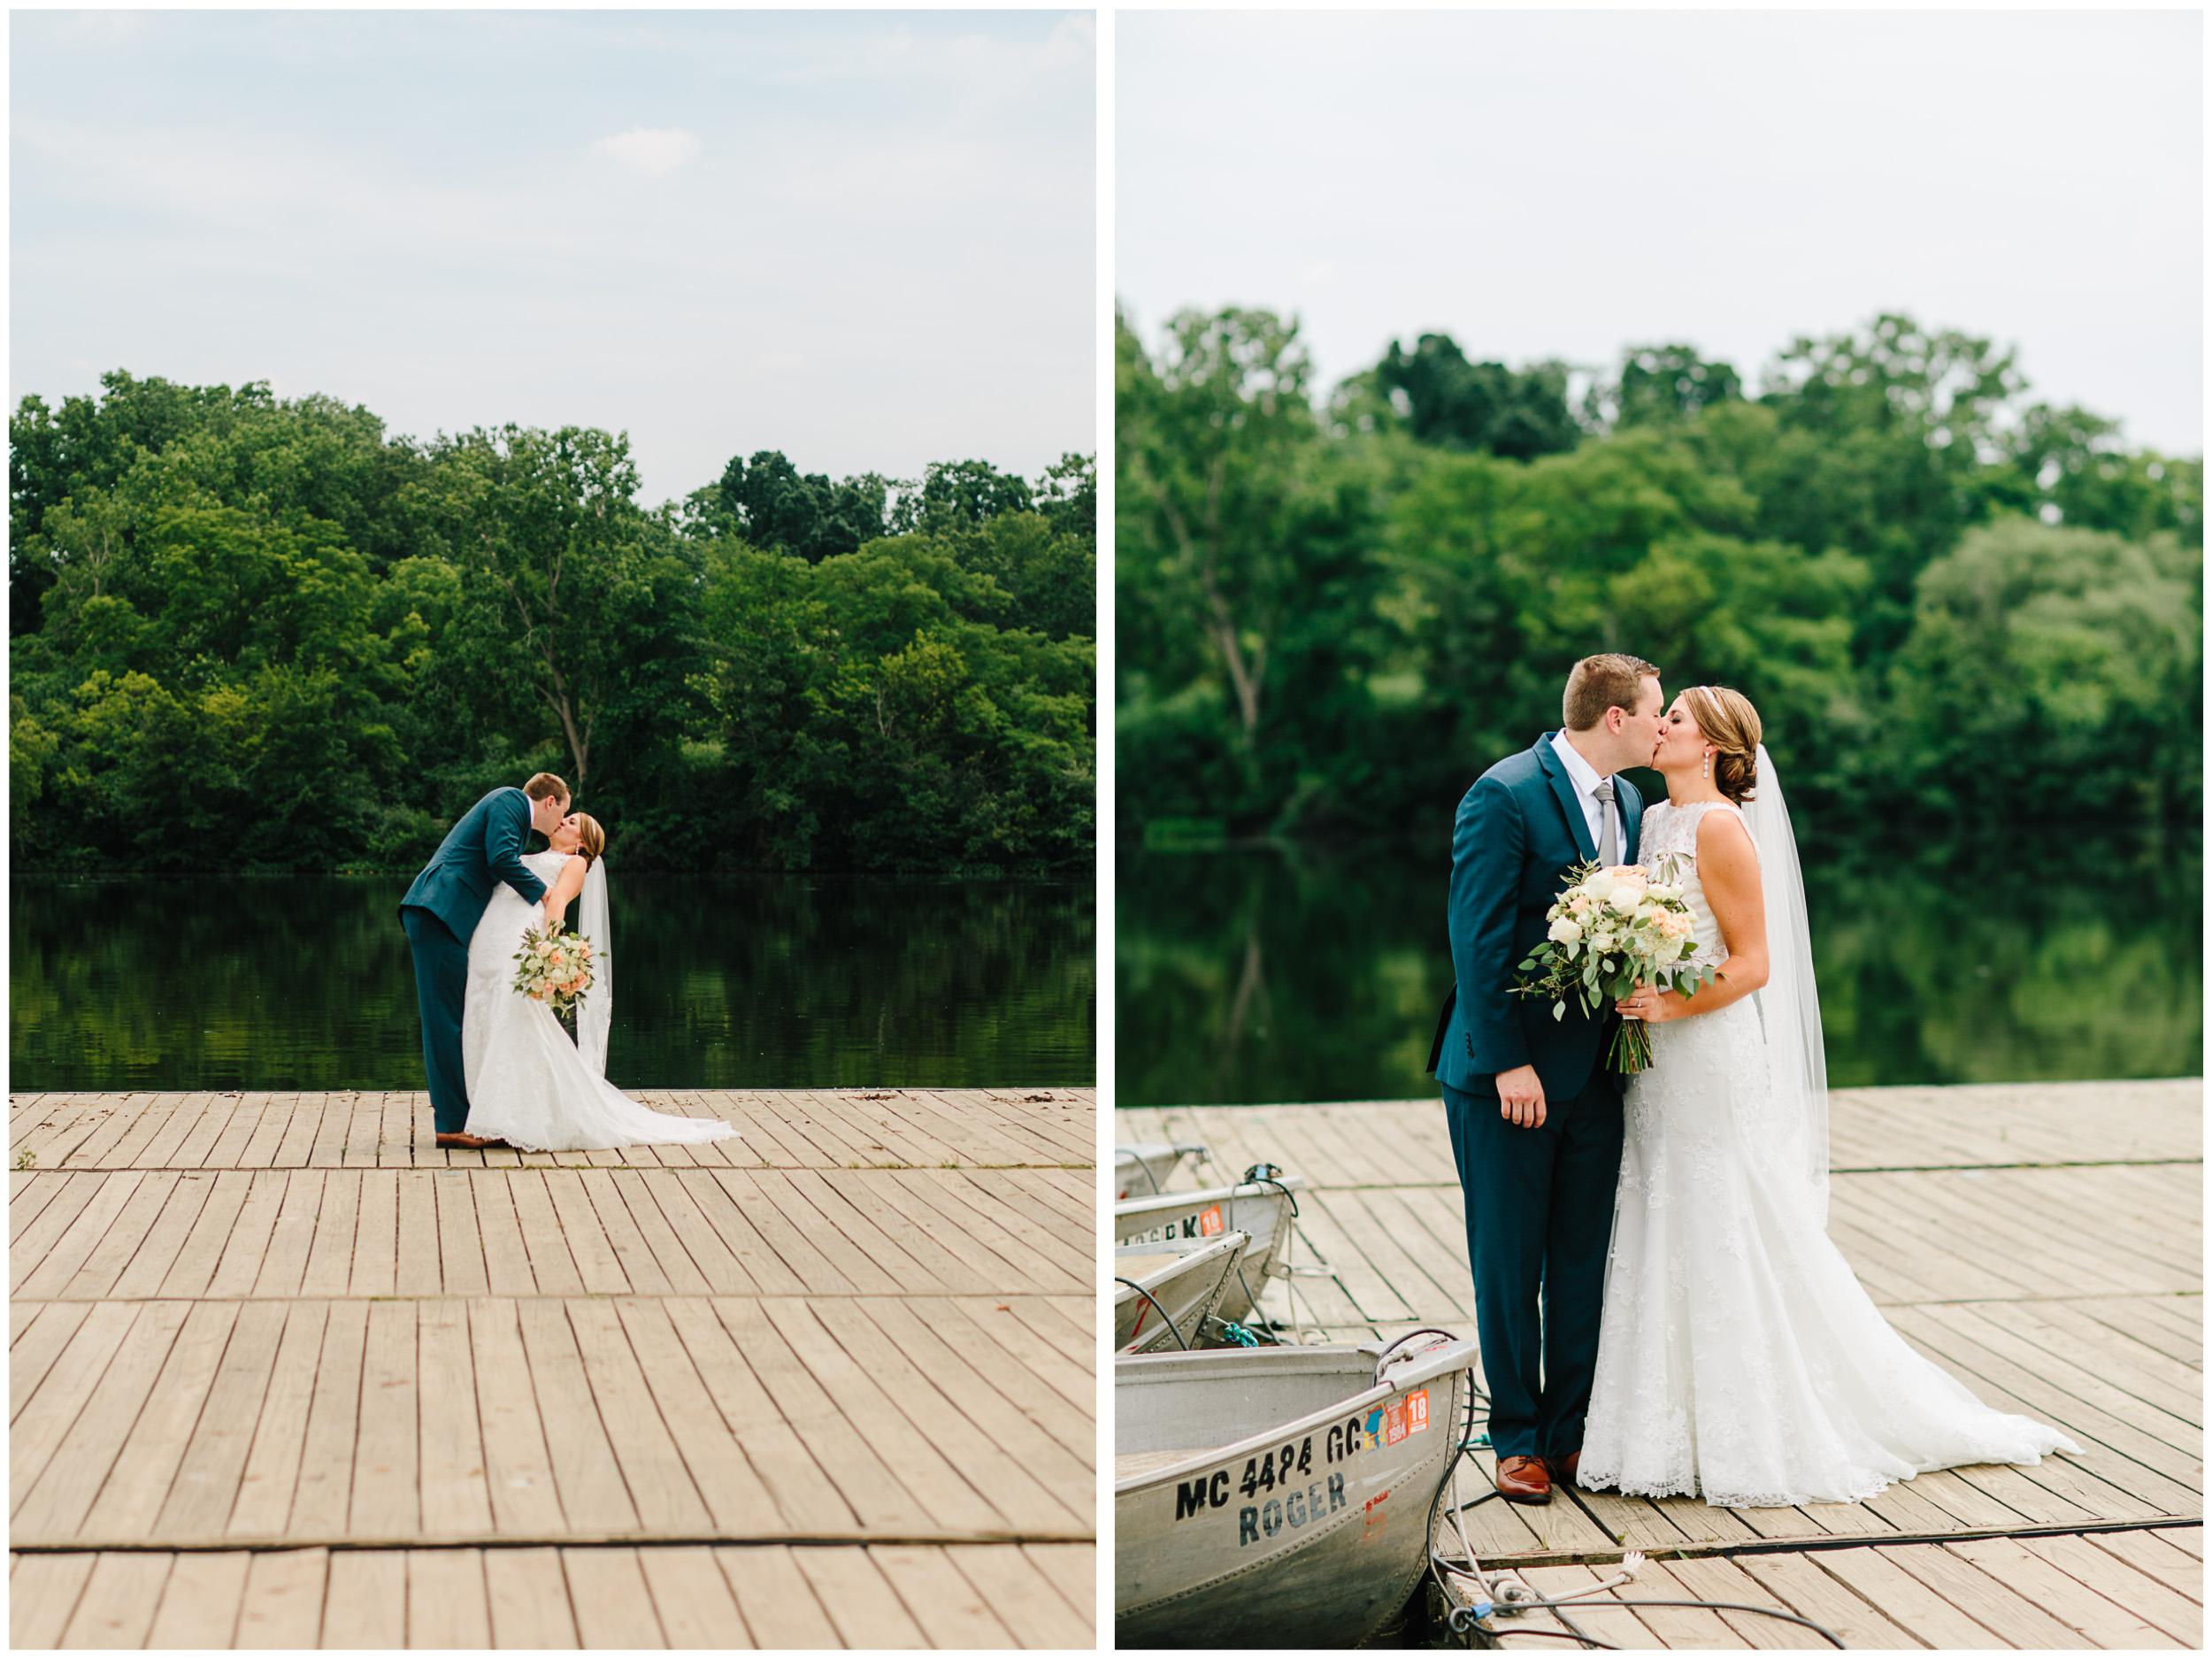 ann_arbor_michigan_wedding_40.jpg